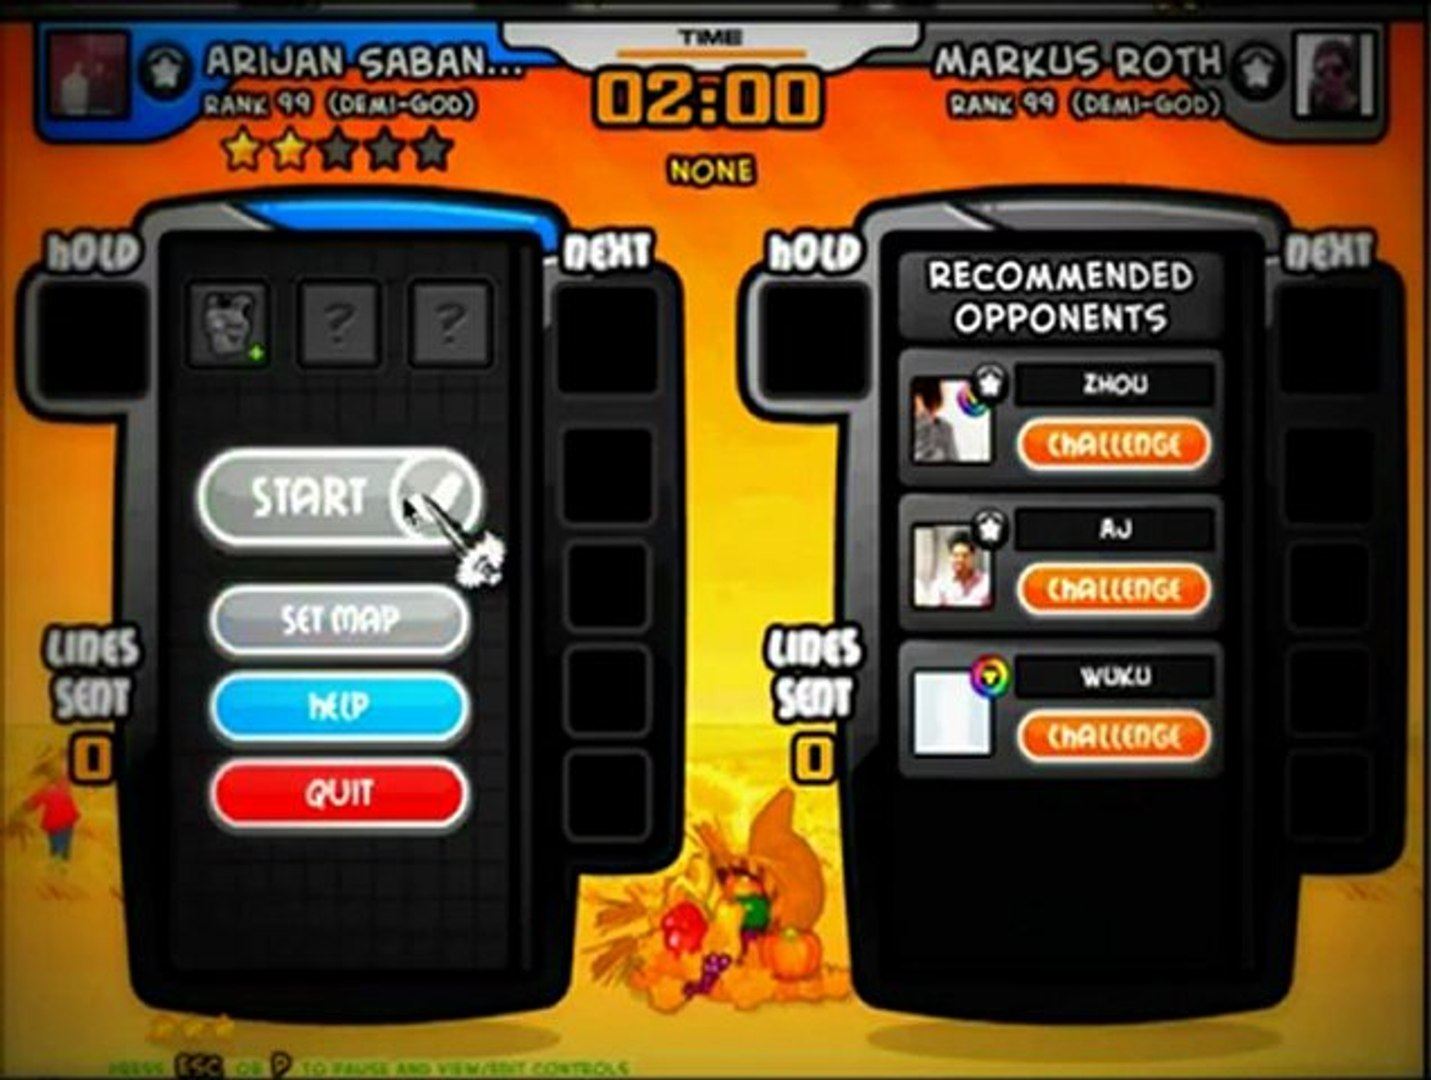 Tetris Battle Cheat  - Rank Hack UP n 2016 n 2017 FREE Download n Télécharger